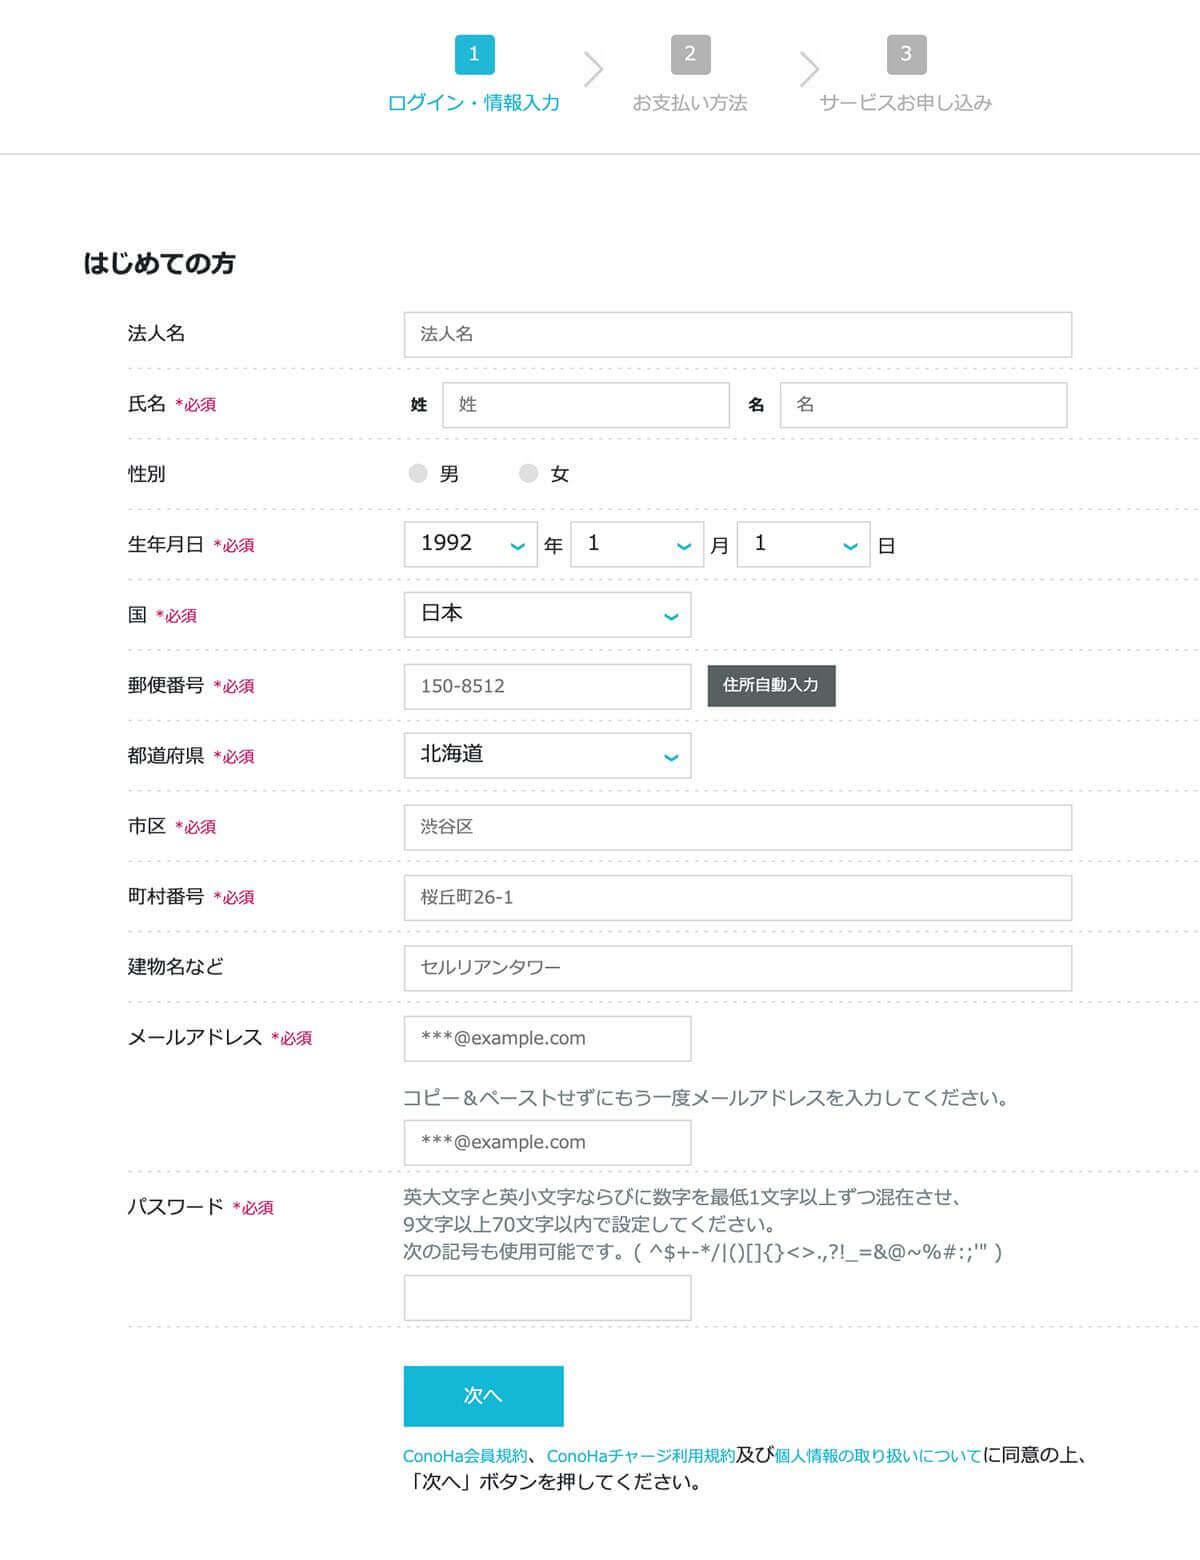 conoha申し込み画面